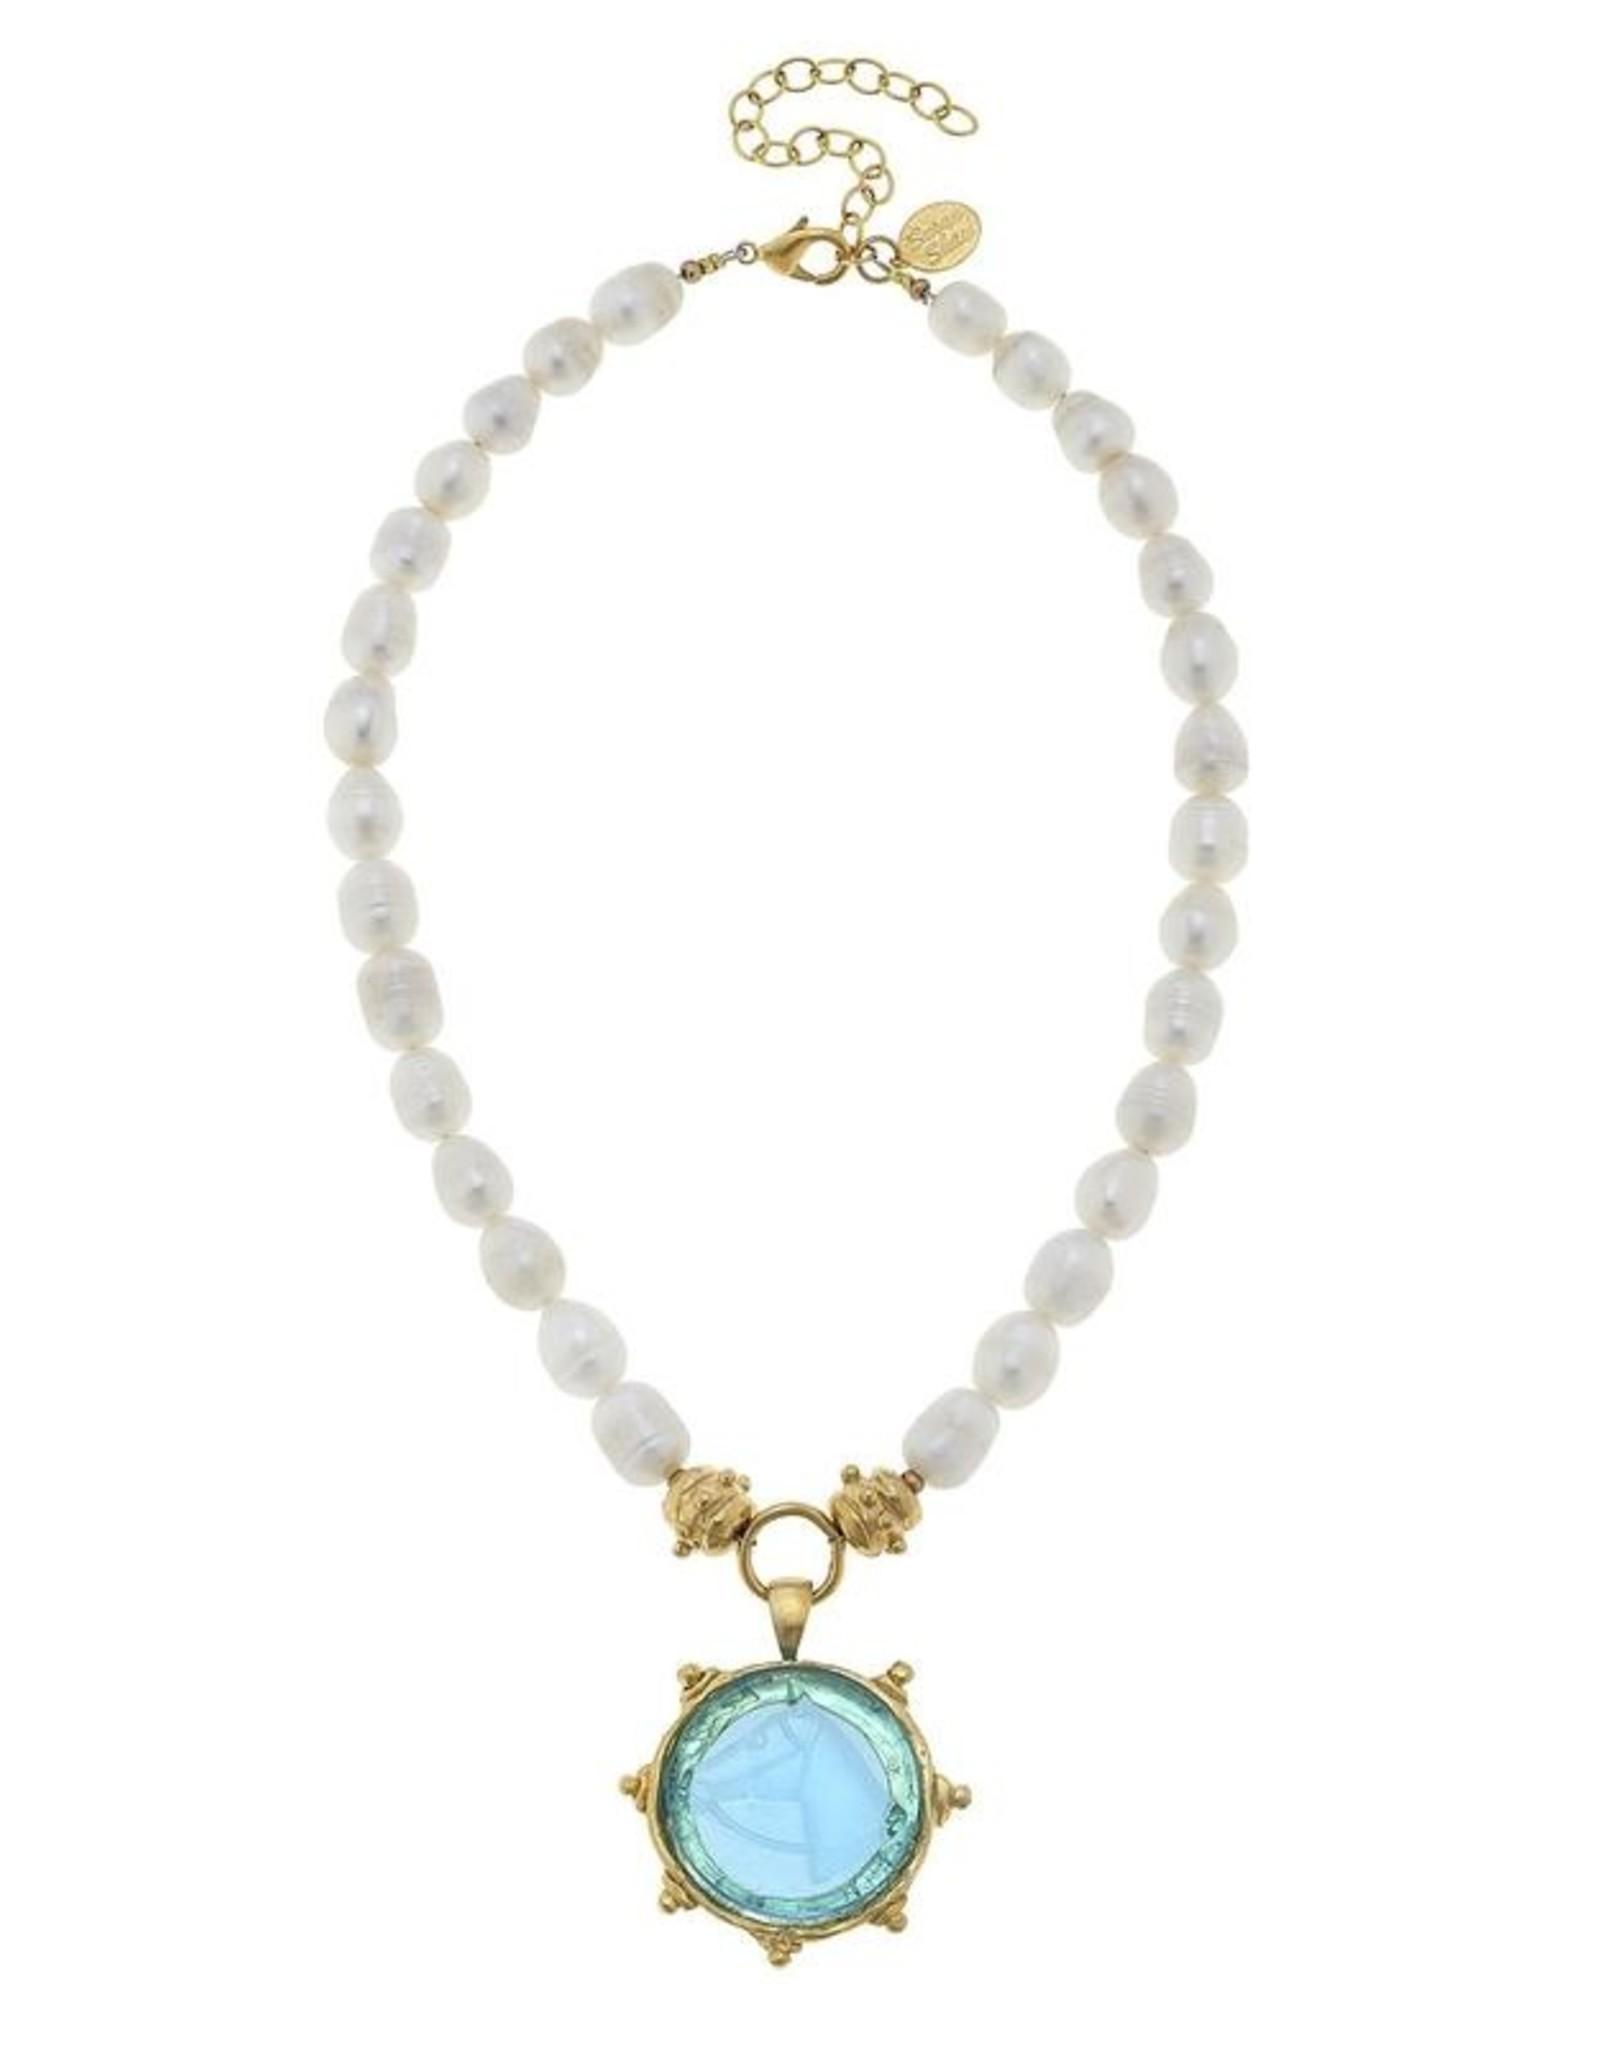 Susan Shaw Shaw Necklace Pearls/BLUE HORSE Intaglio